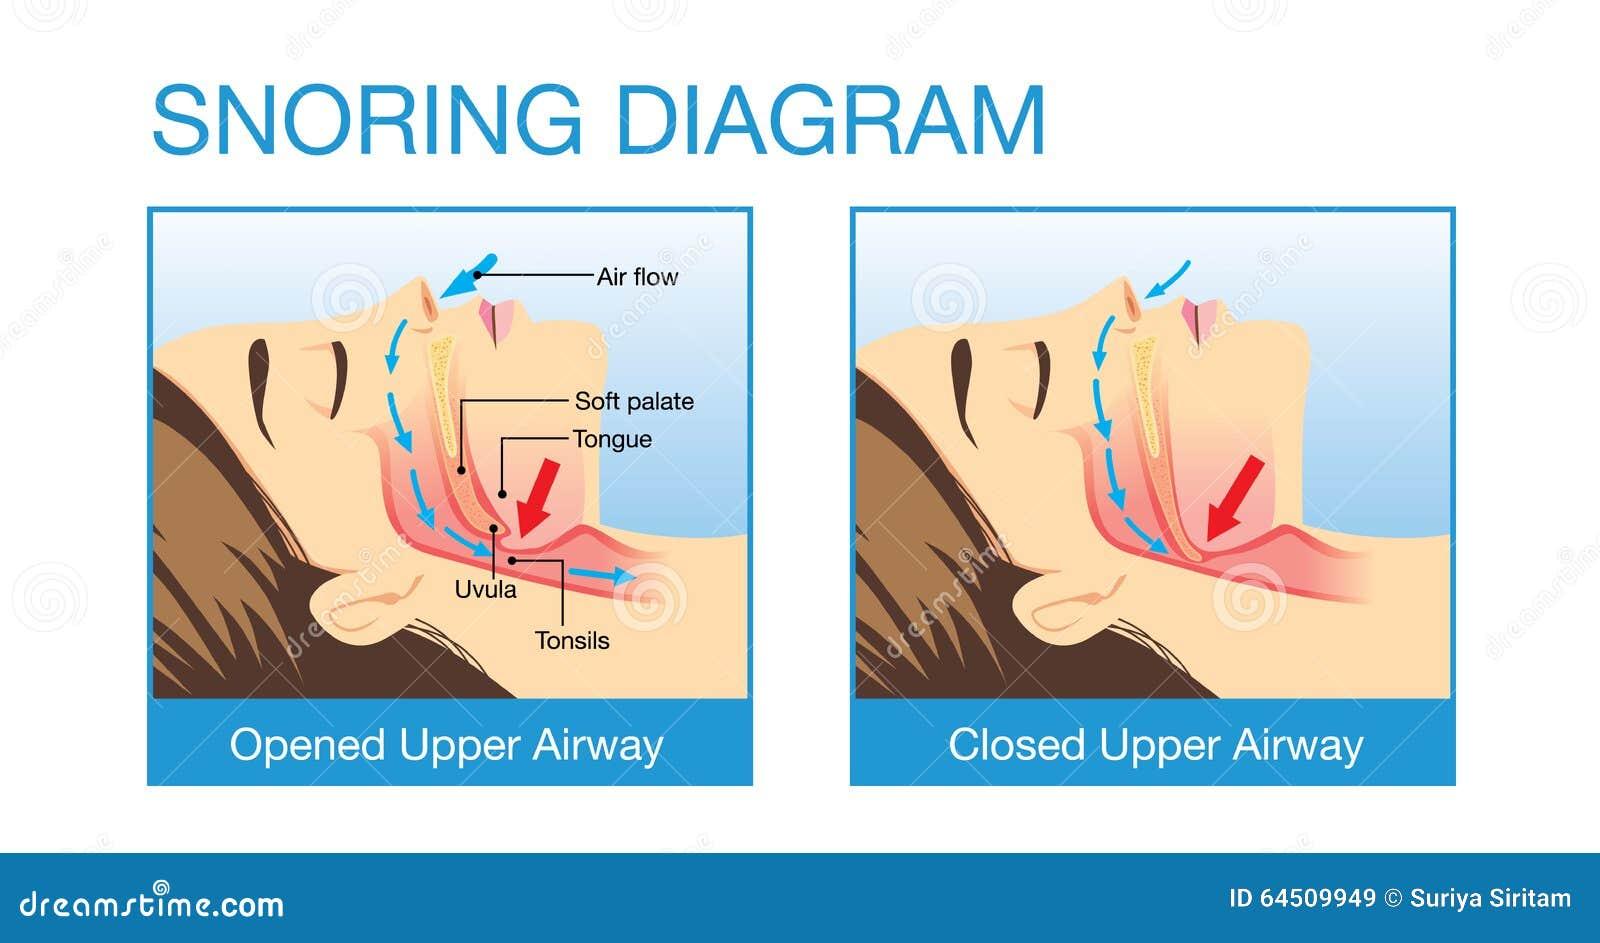 anatomy of human airway while snoring